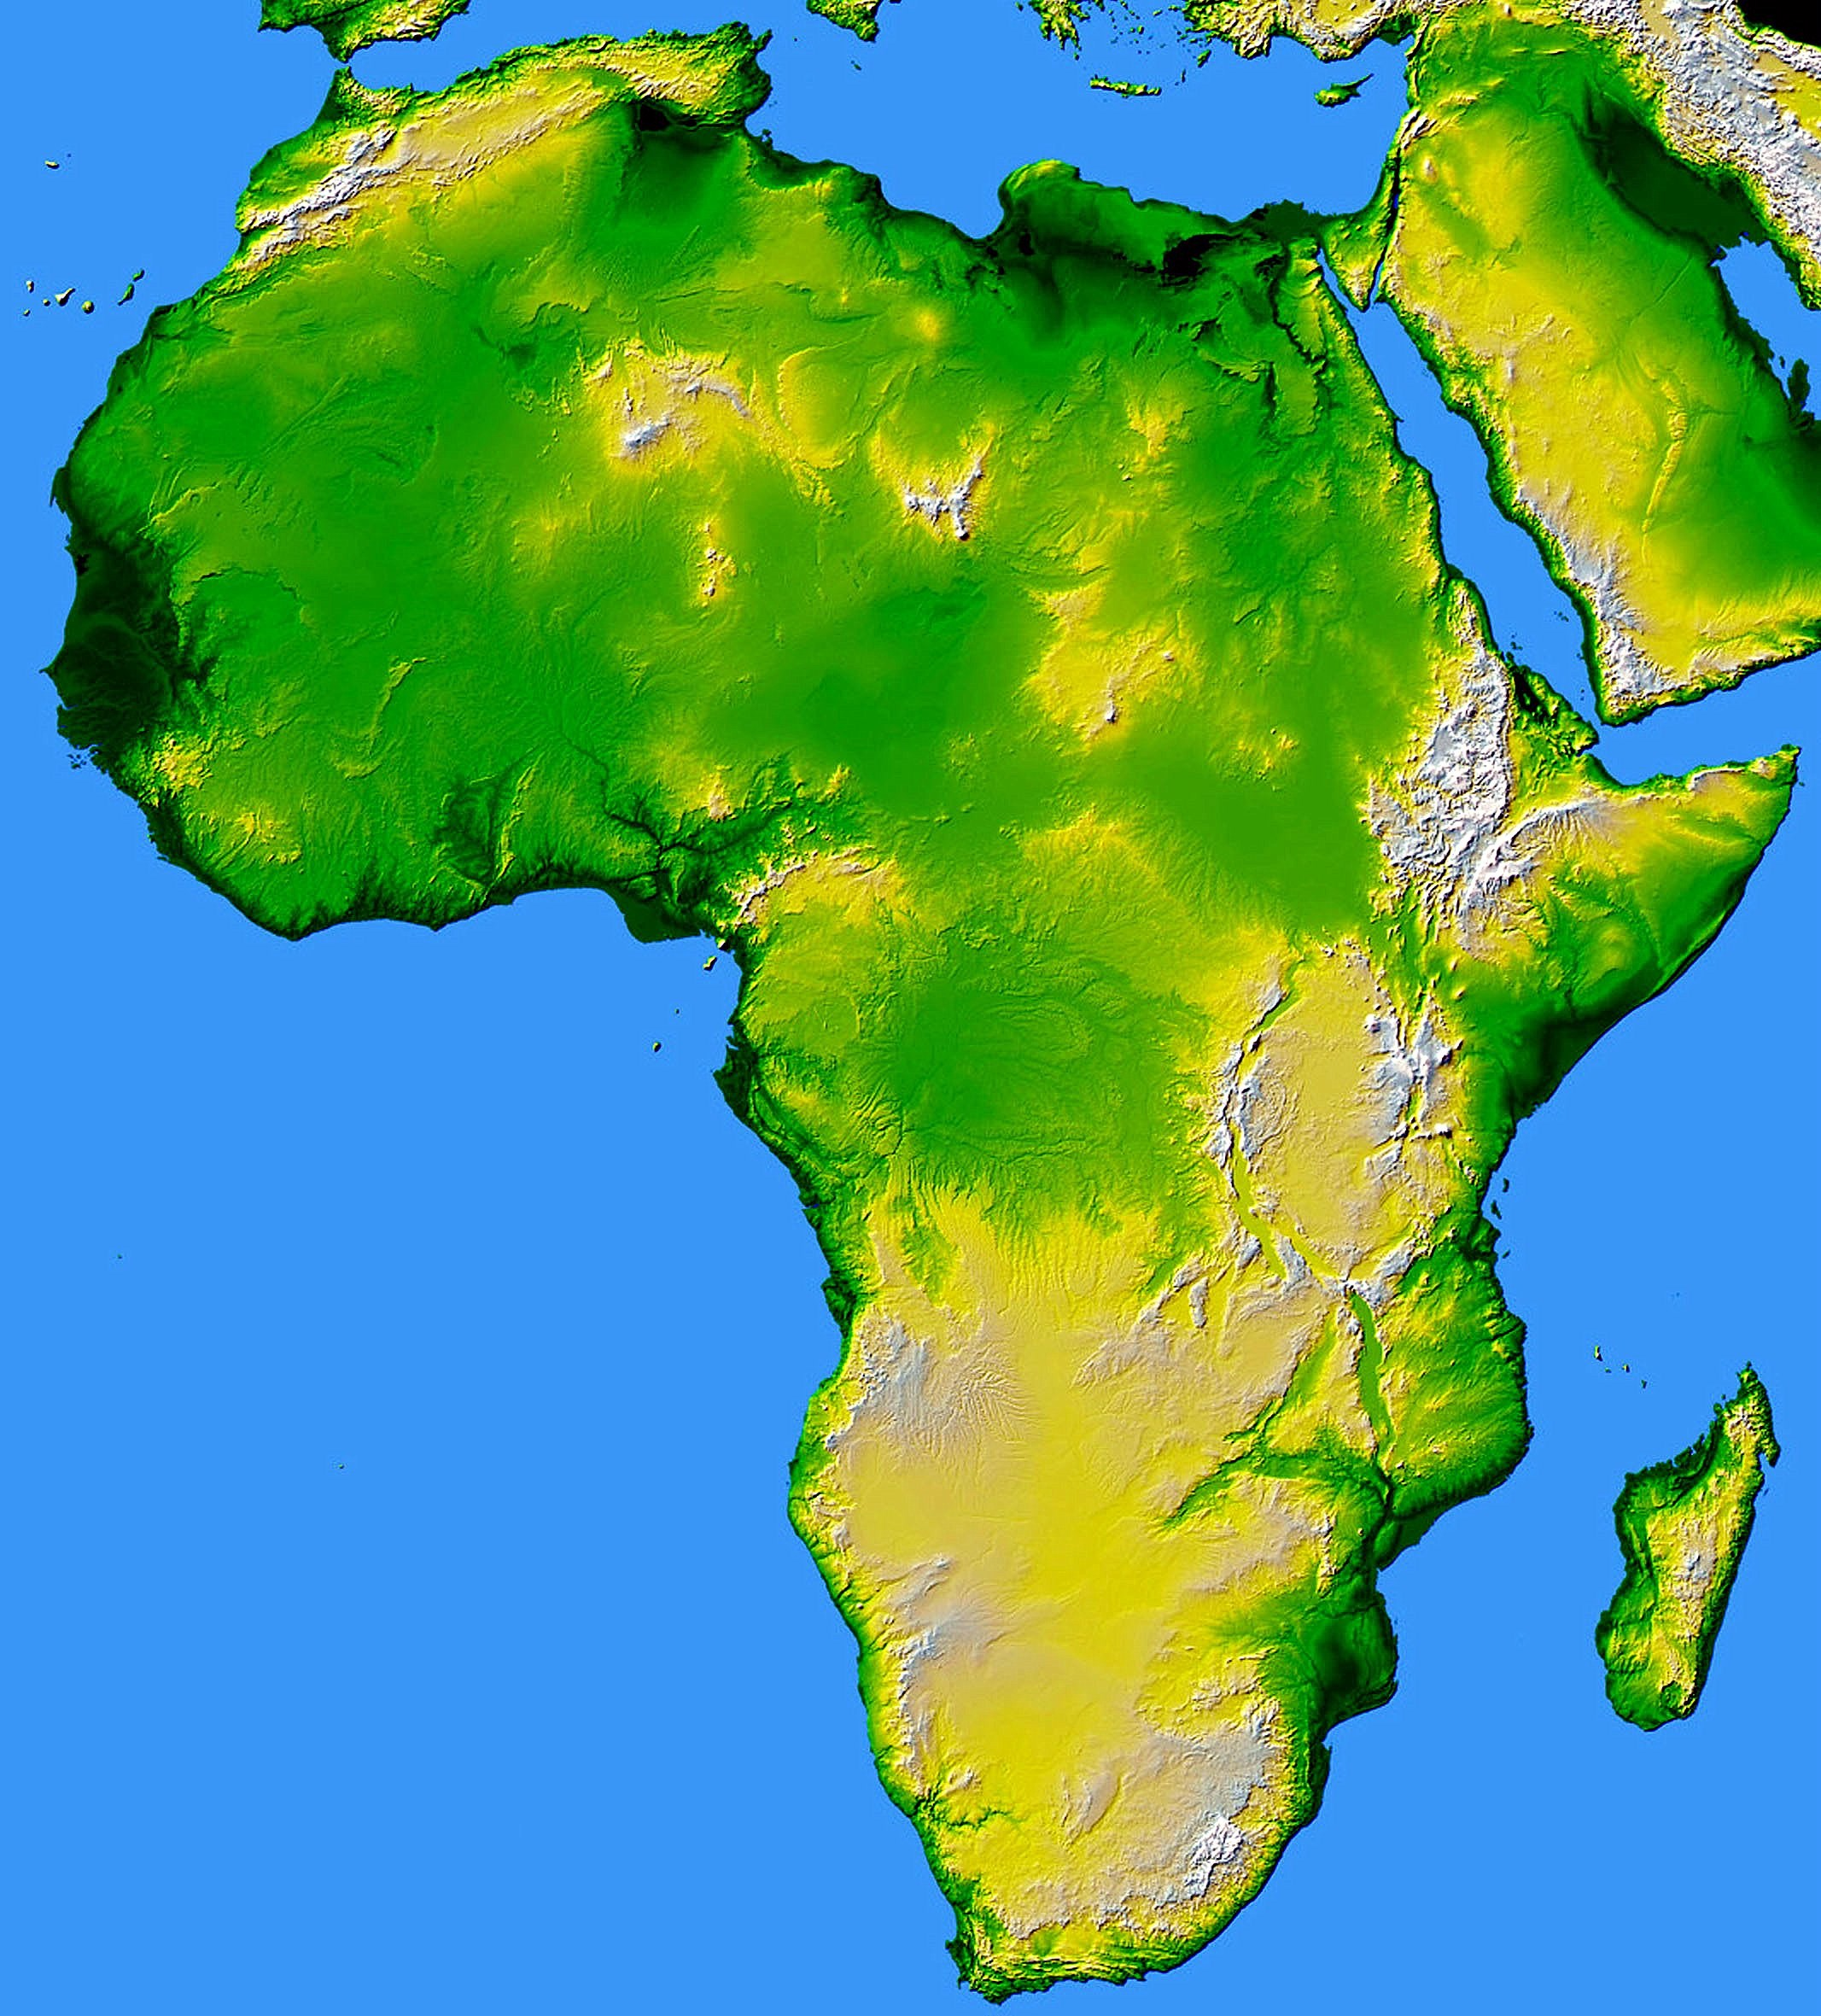 africa-1080p-high-quality-Ashford-Black-x-wallpaper-wp3402202